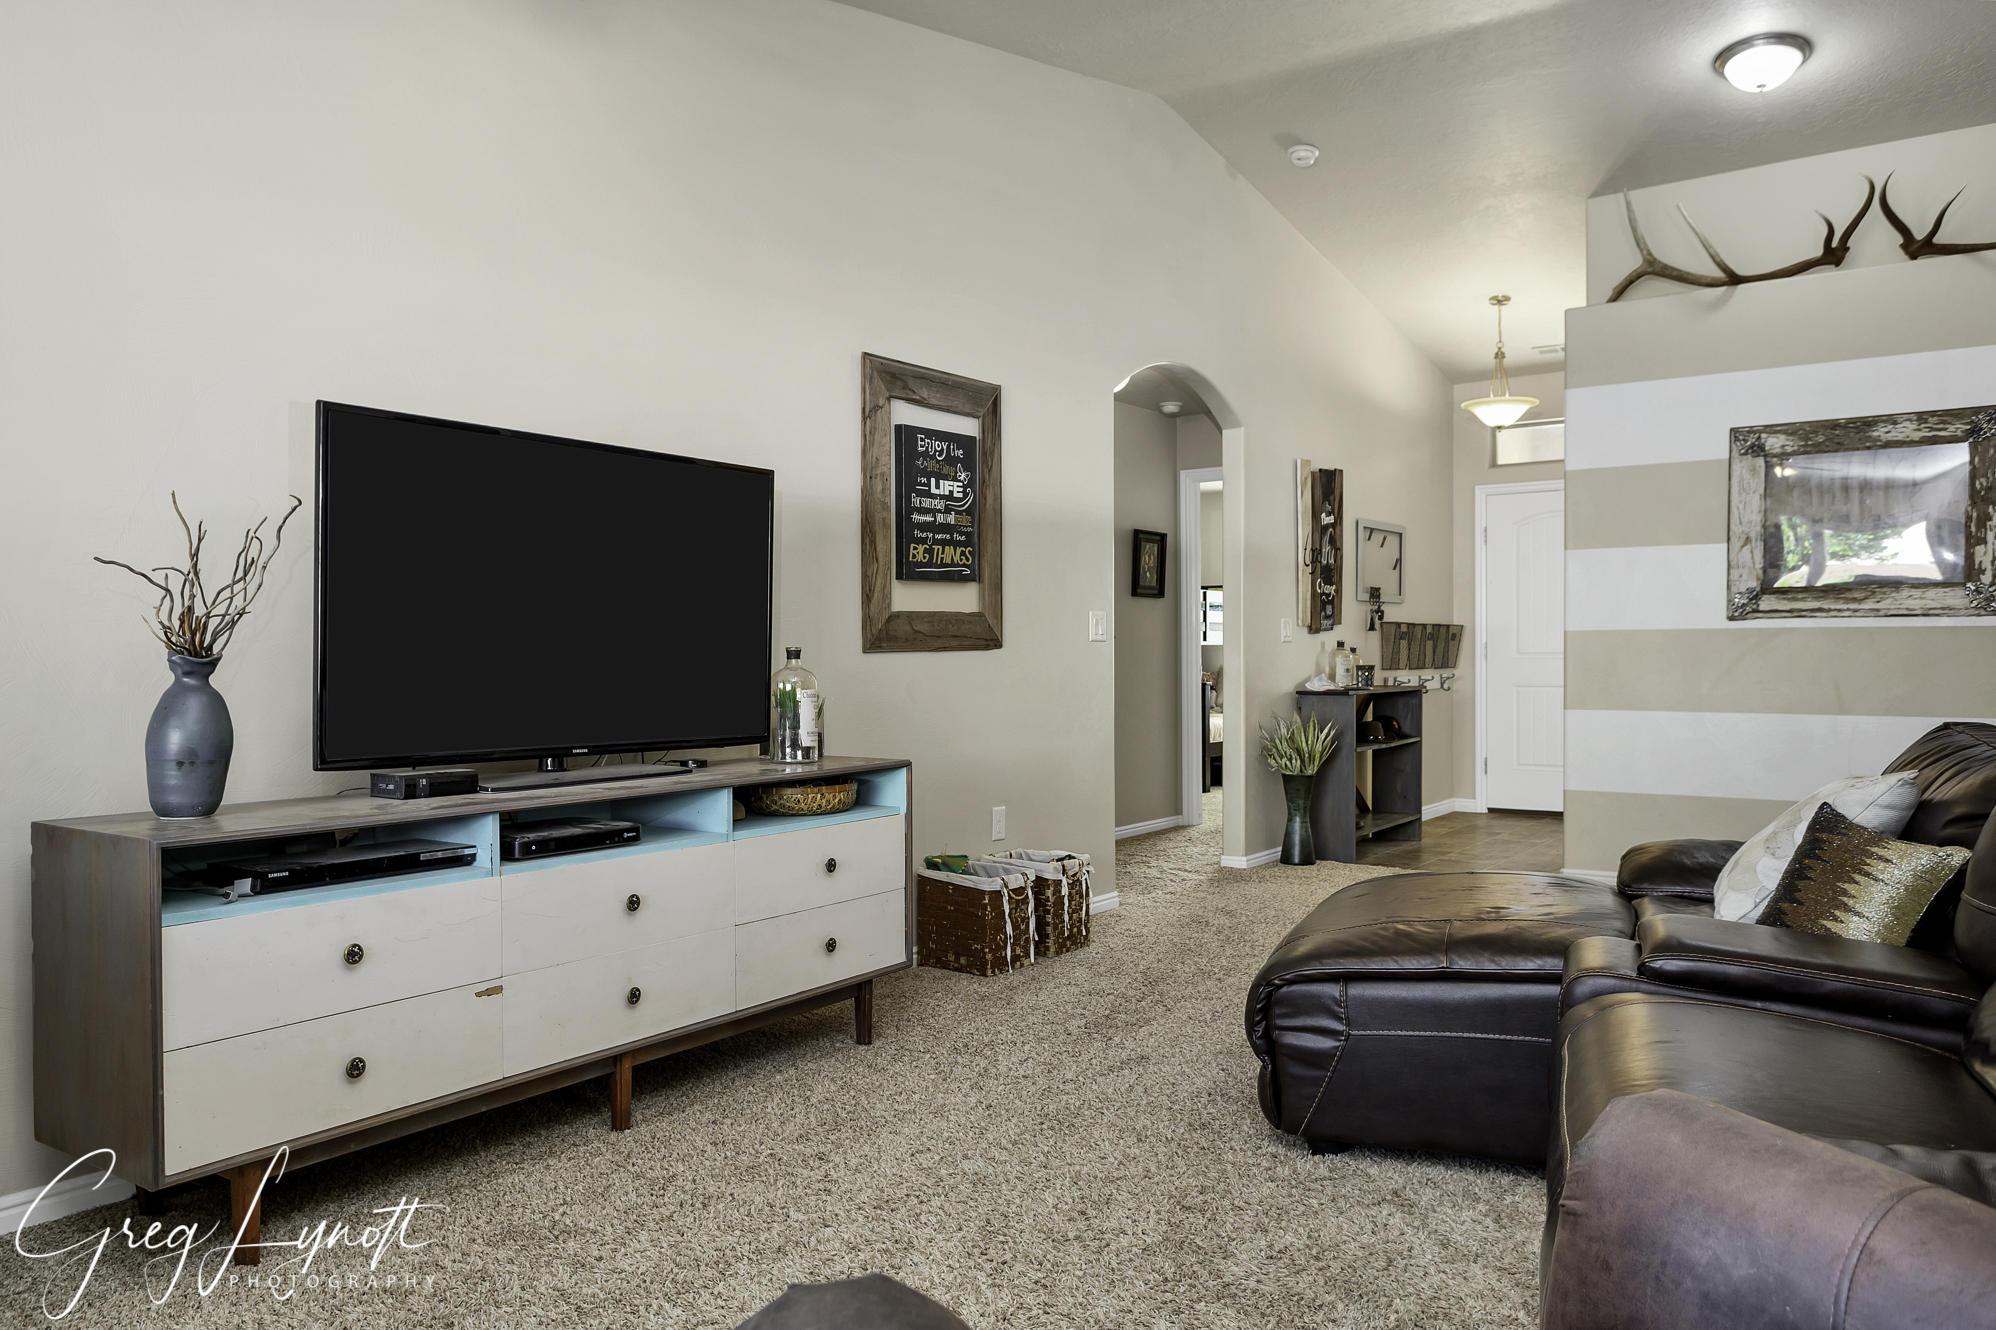 1063 Camel Springs Drive Washington Utah 84780 Single Family Homes for Sale